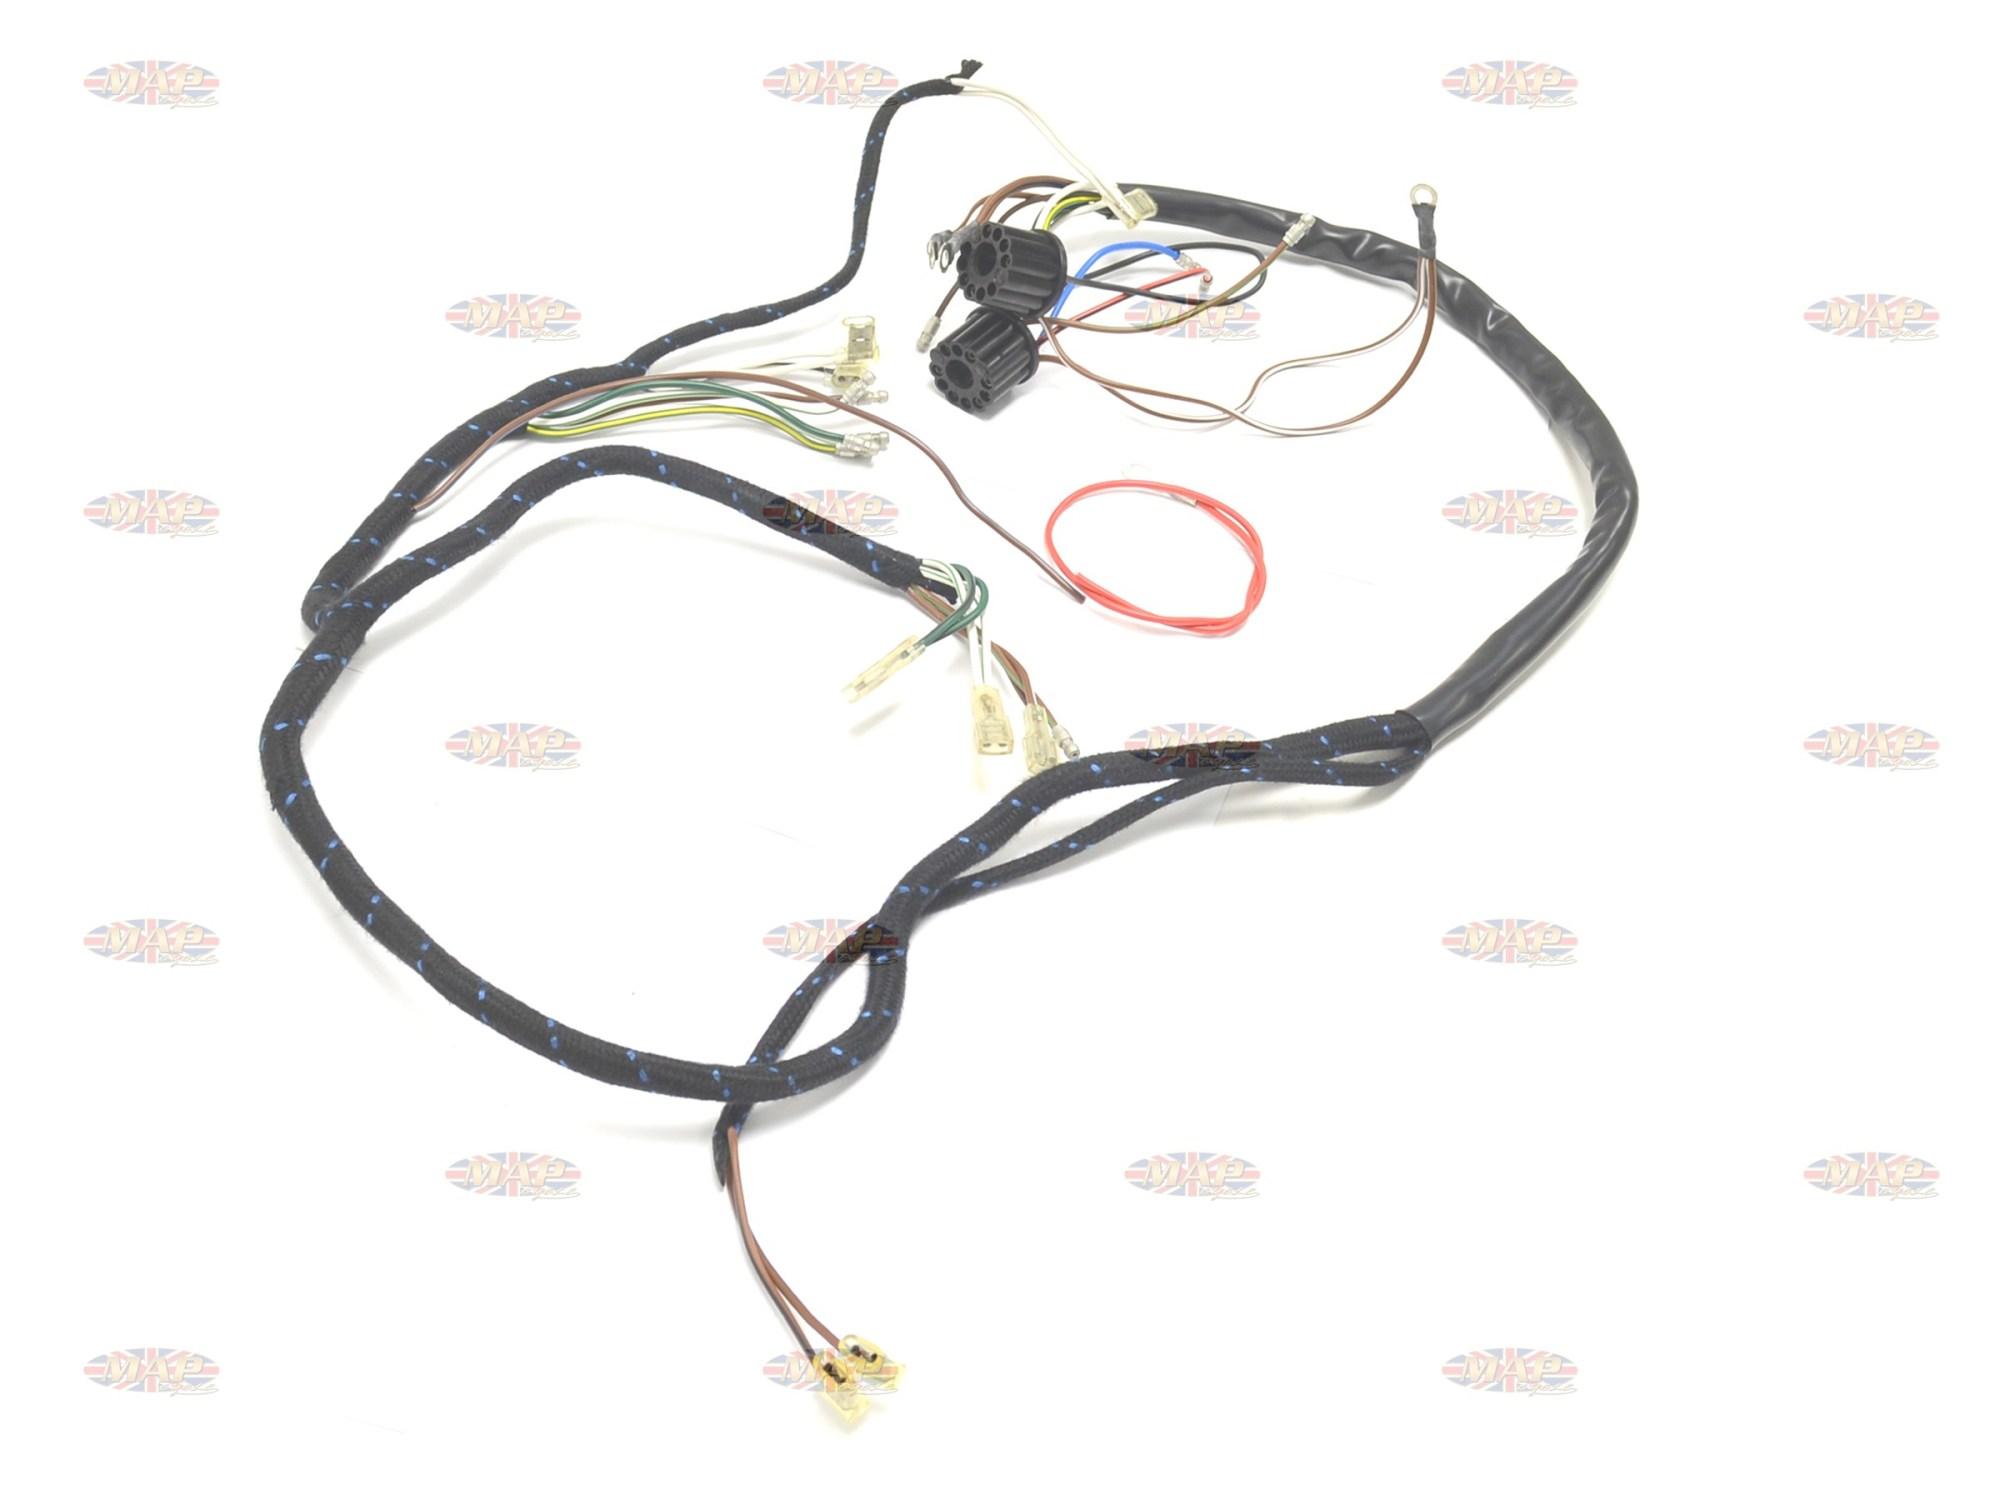 hight resolution of bsa 1962 65 a65 english made 6 volt wiring harnessbsa 1962 65 a65 english made 6